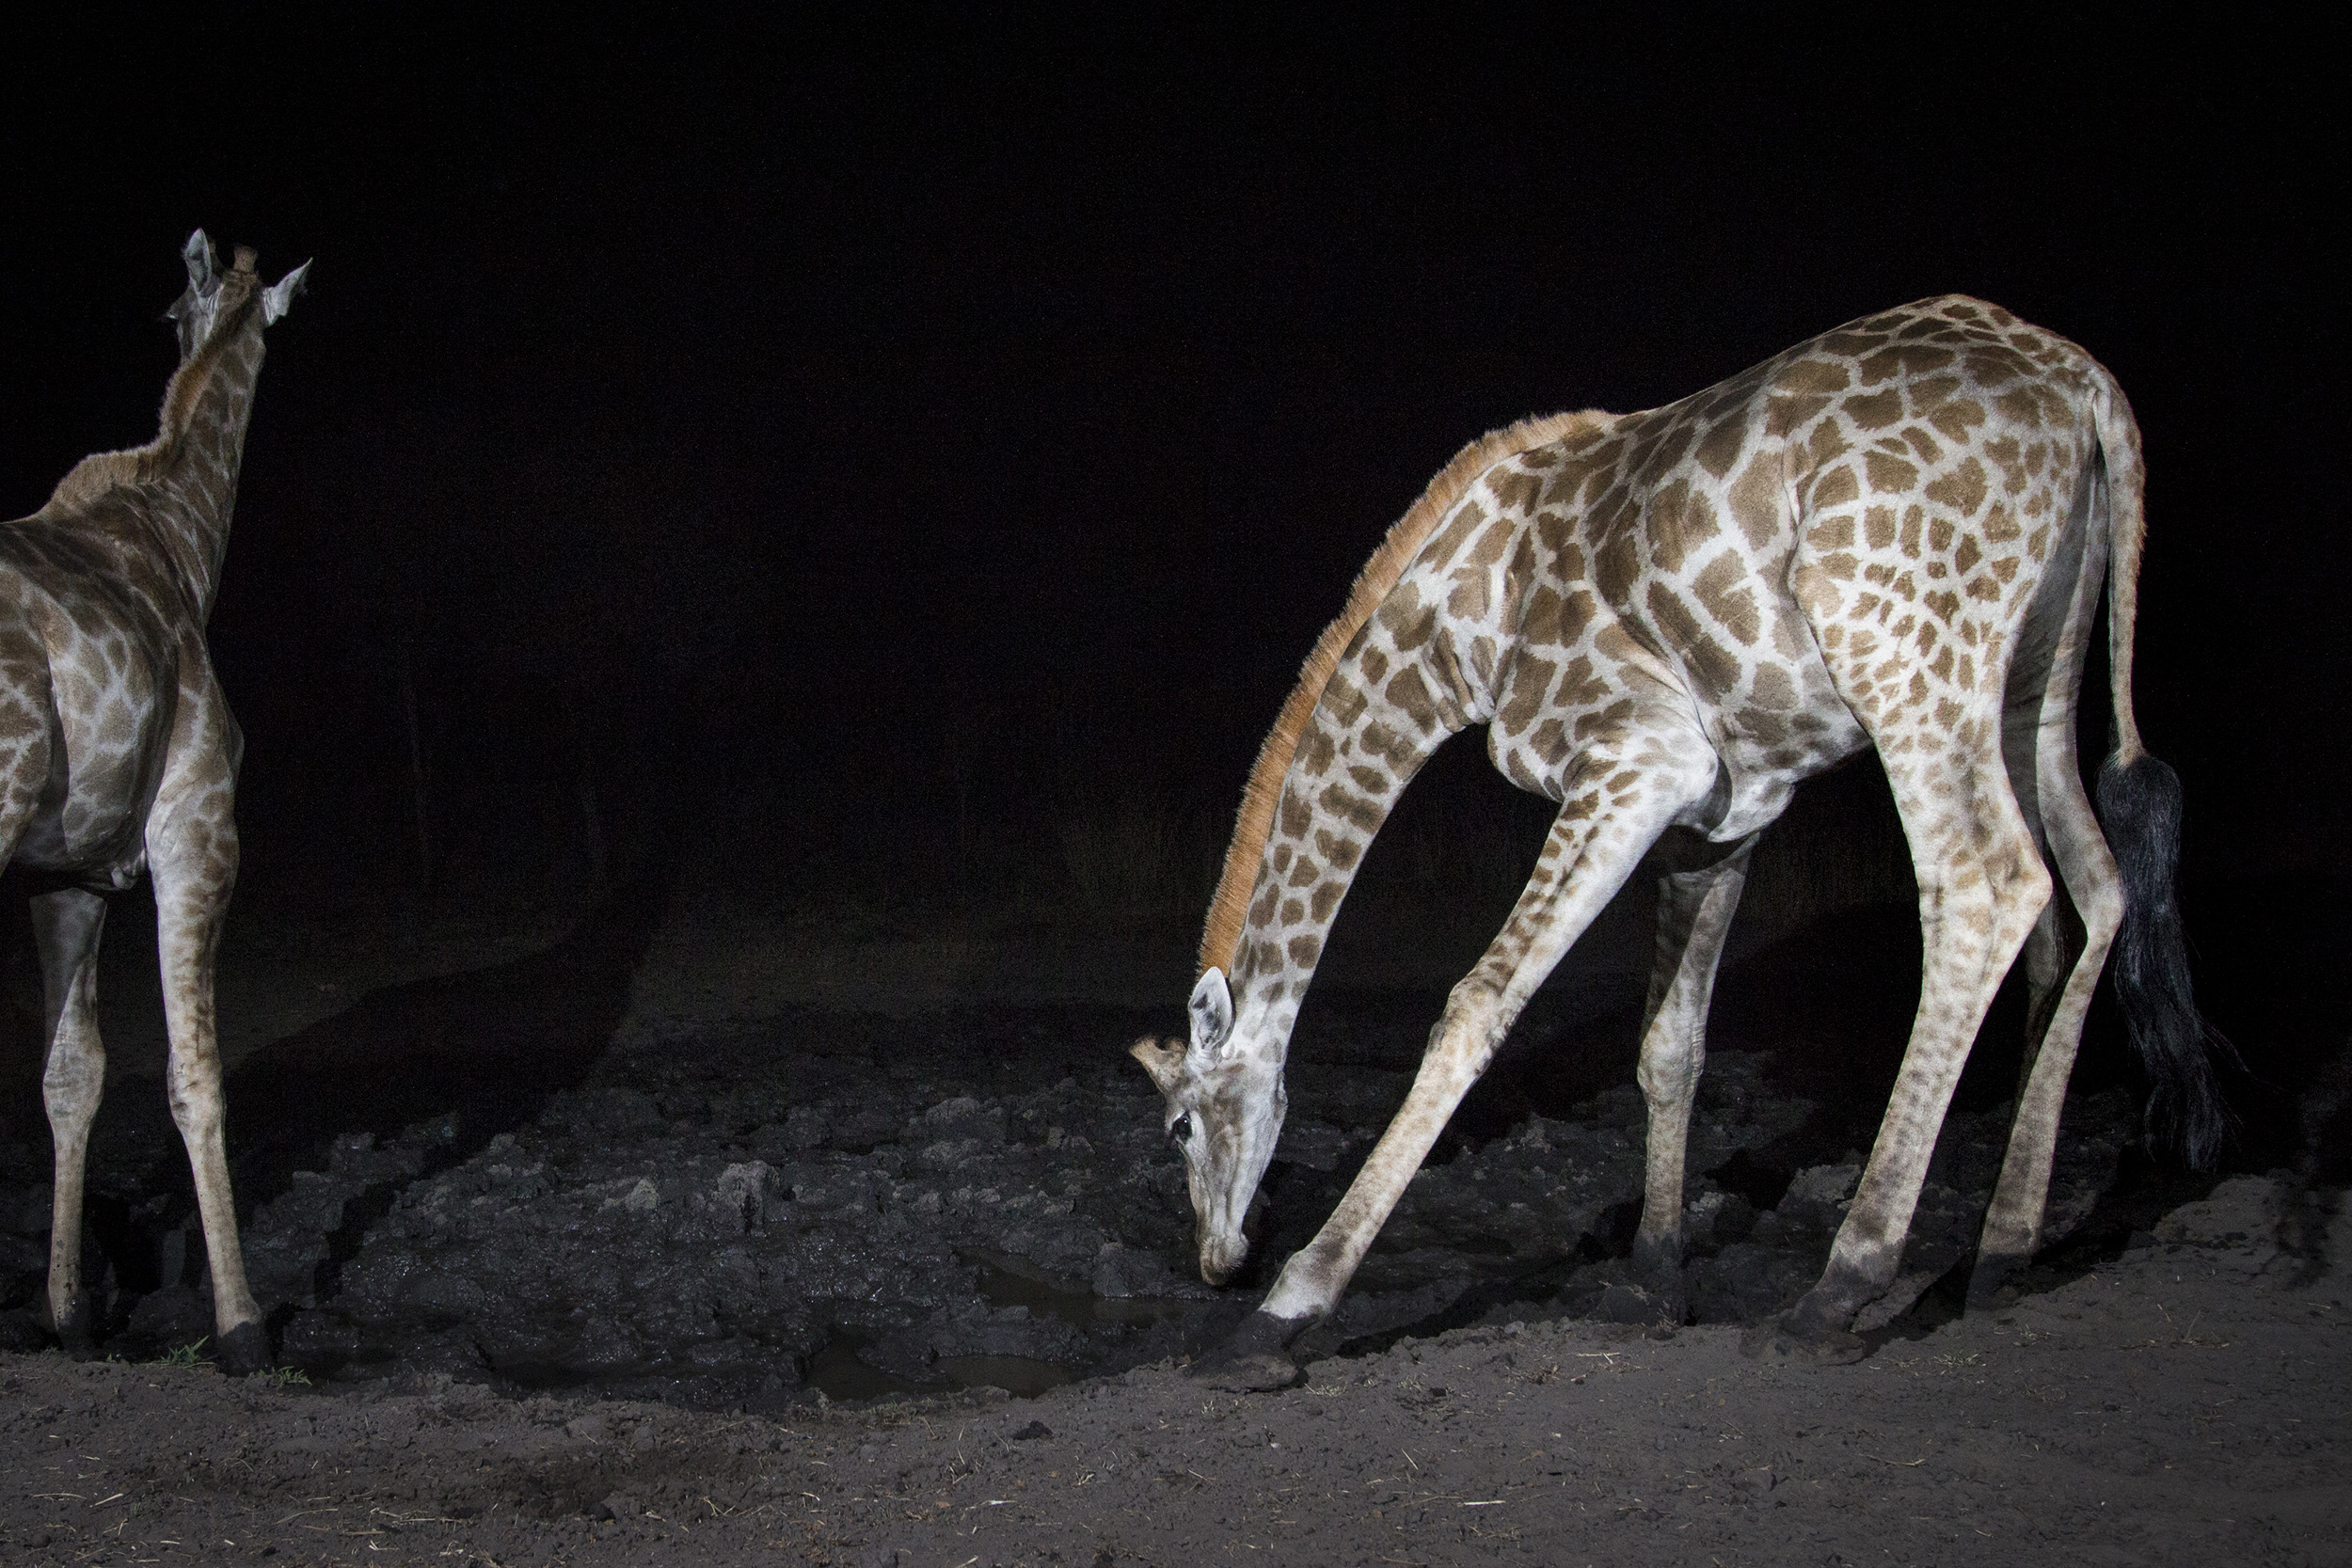 A camera trap image of a giraffe using Camtraptions PIR motion sensor.